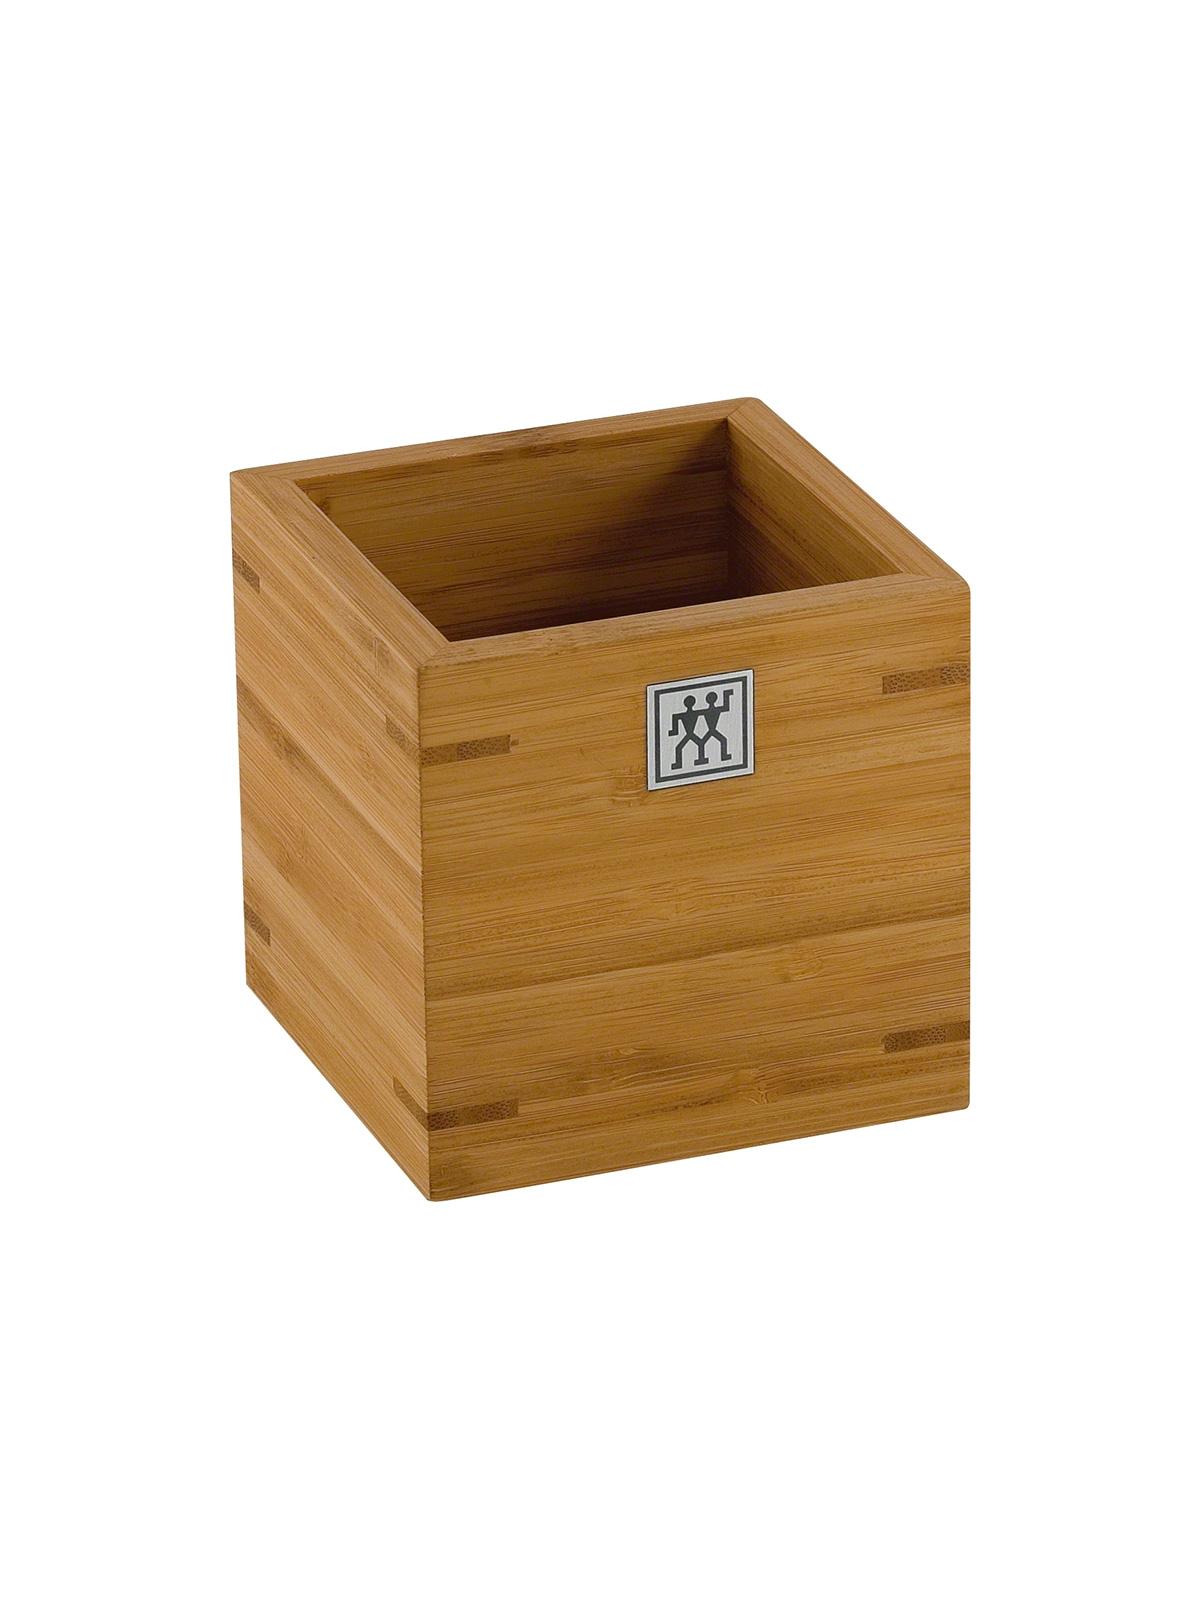 Zwilling Tool box kutija mala 11 cm